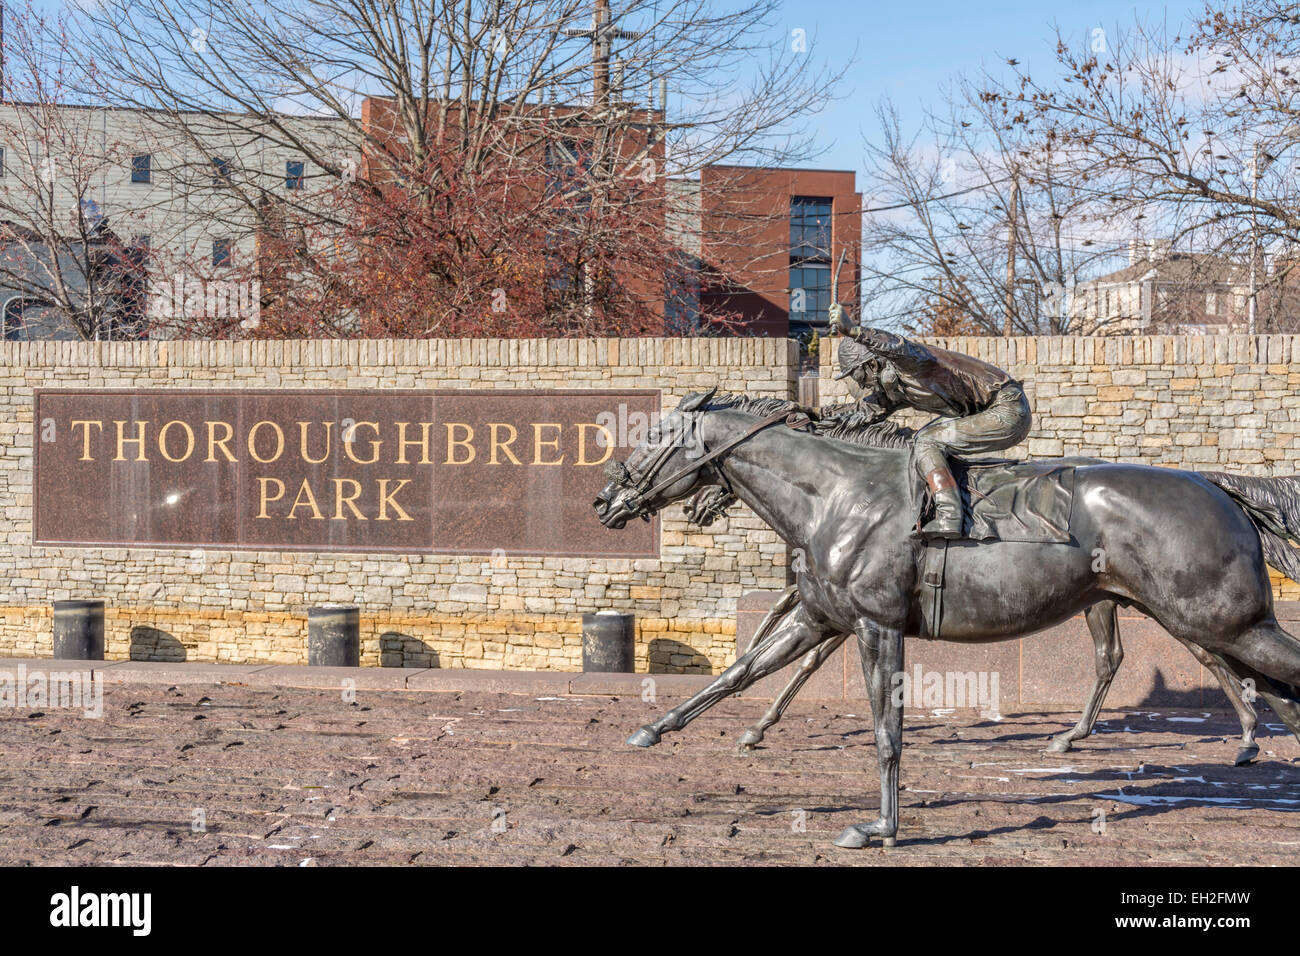 Horse racing sculptures at Thoroughbred Park in Lexington Kentucky USA - Stock Image